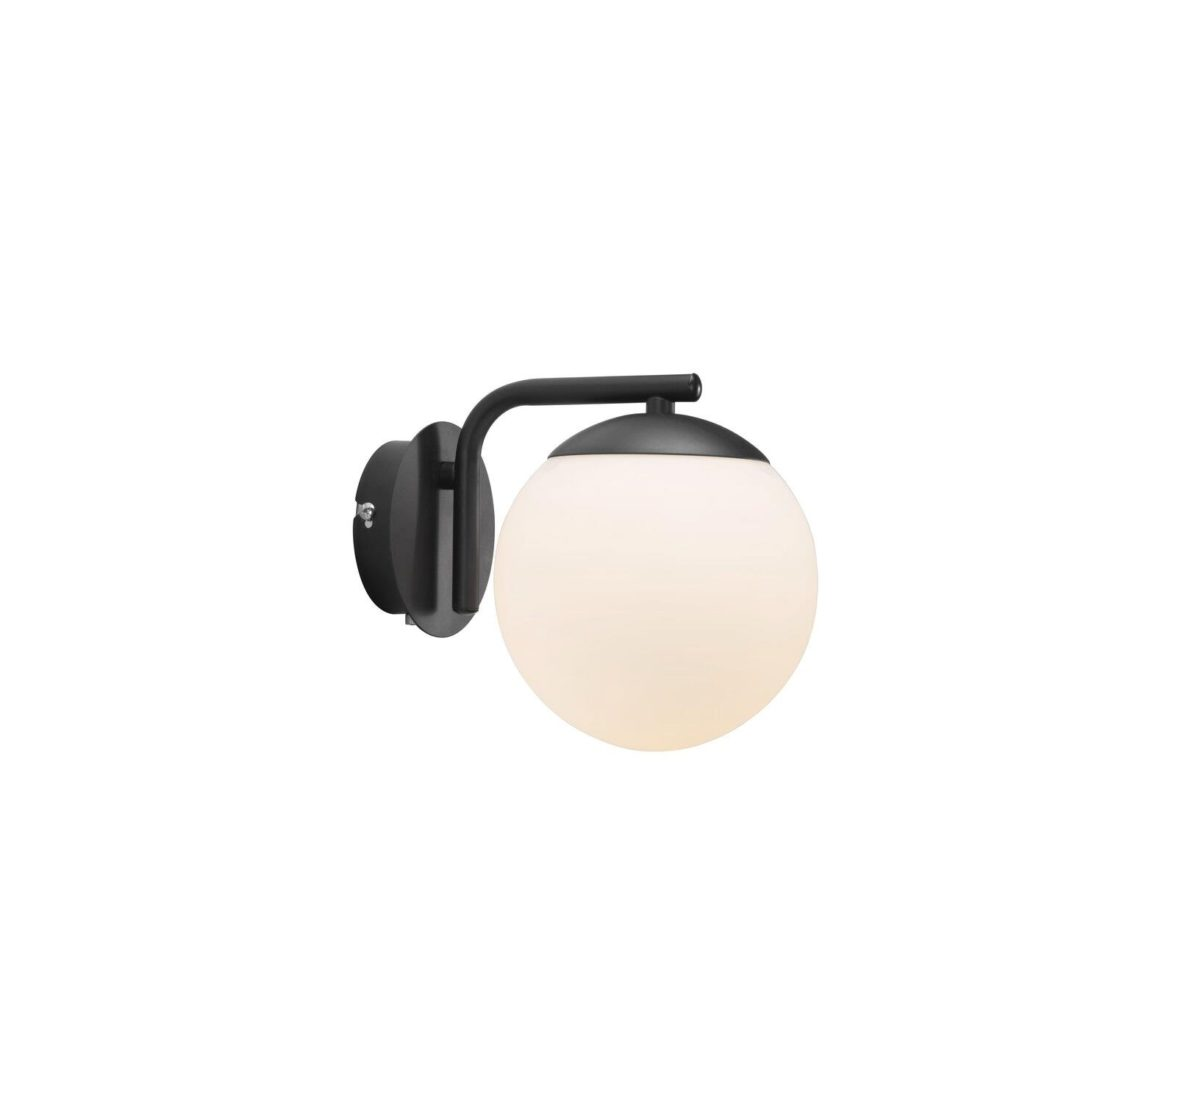 GRANT 47091003 šviestuvas | Nordlux